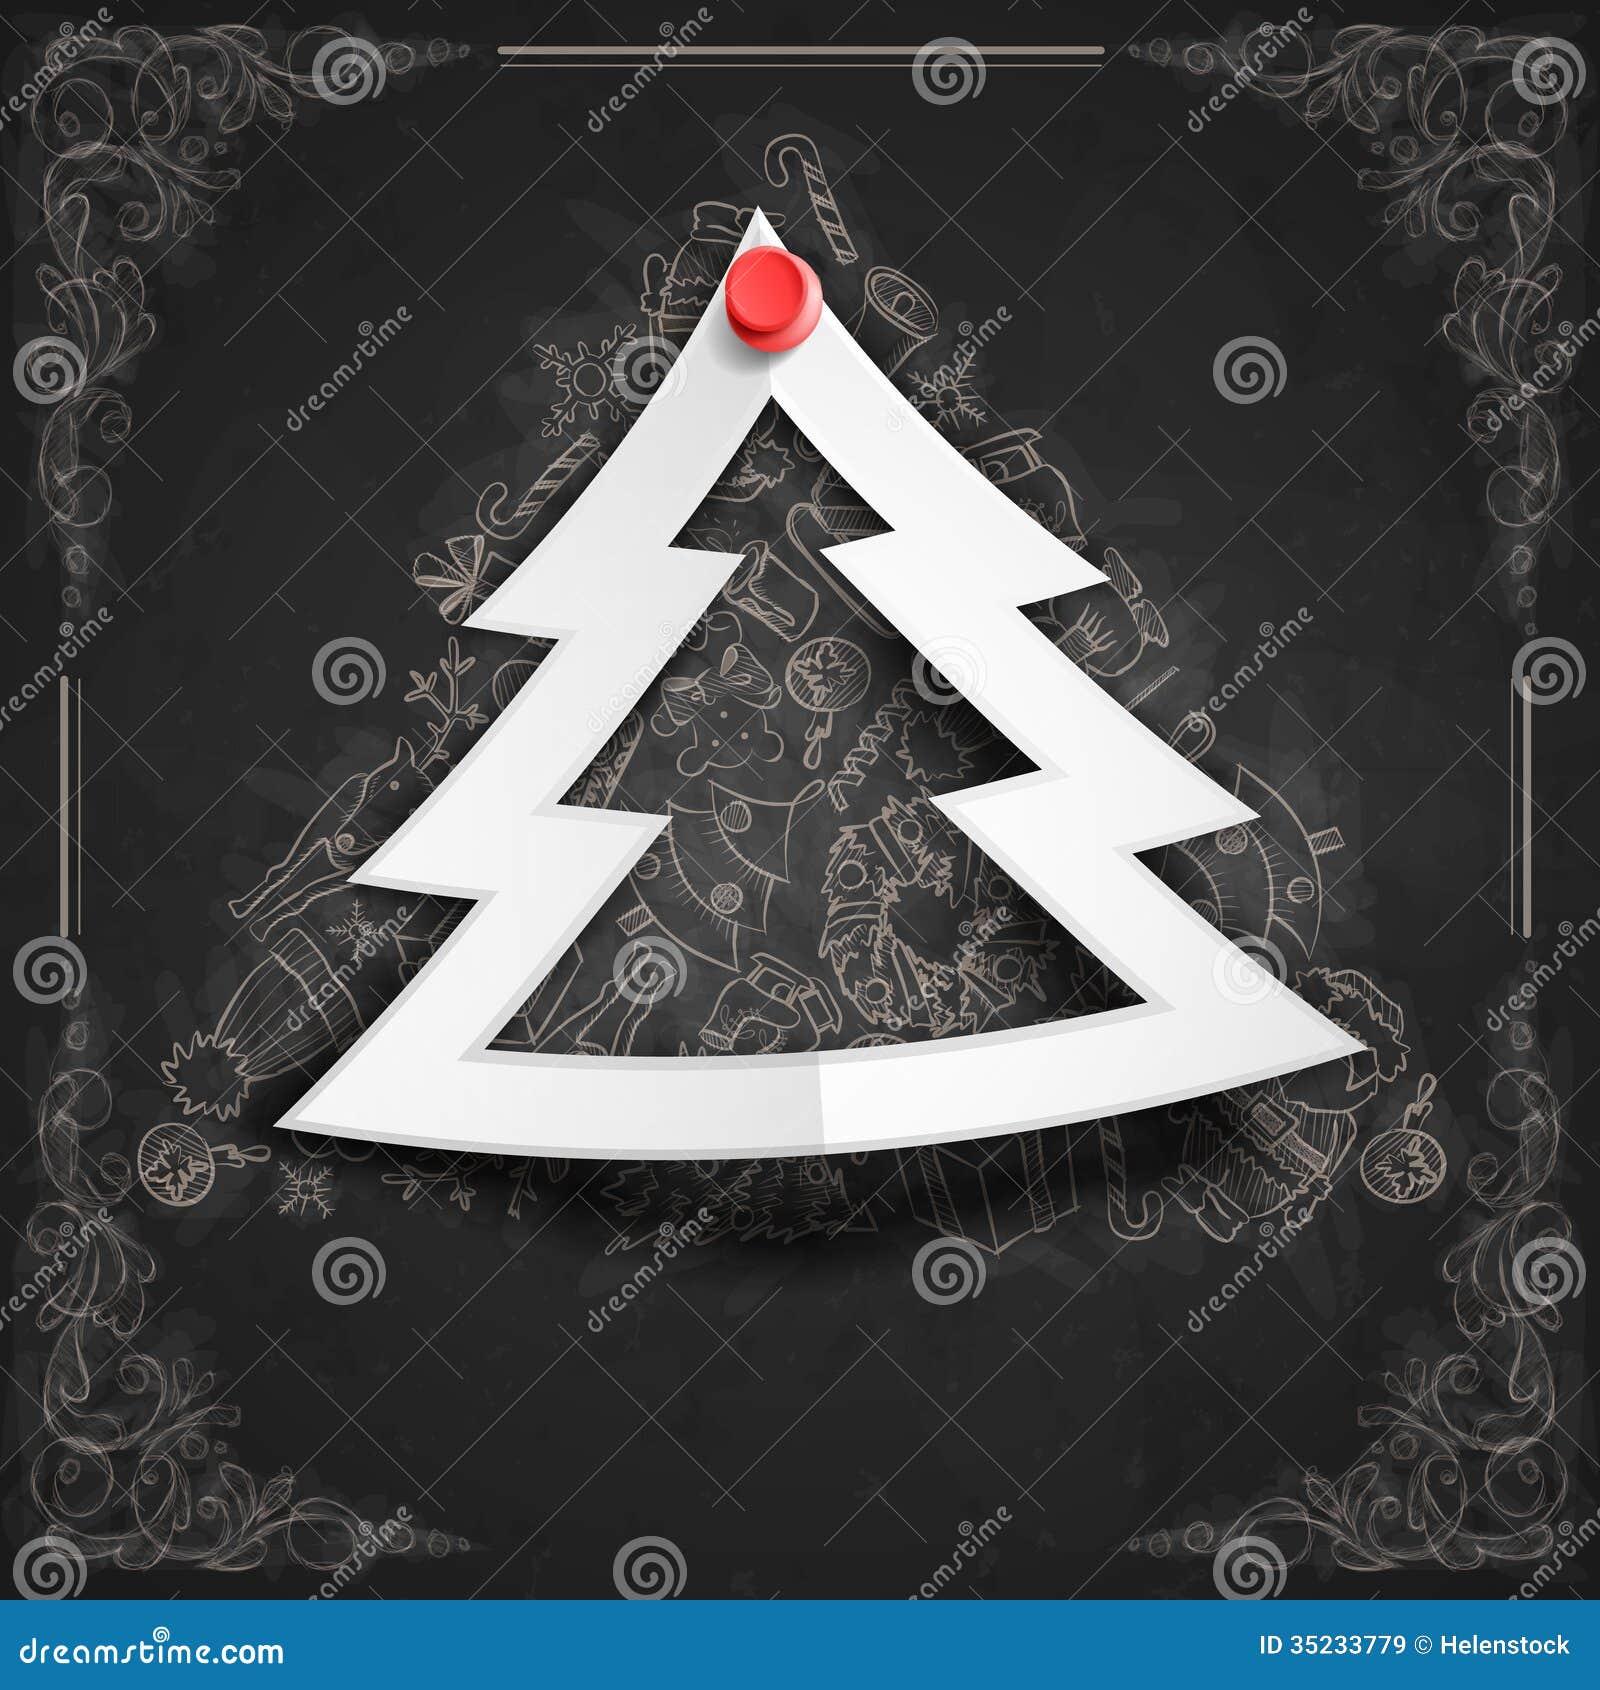 Merry Christmas Stylish Tree. Royalty Free Stock Images